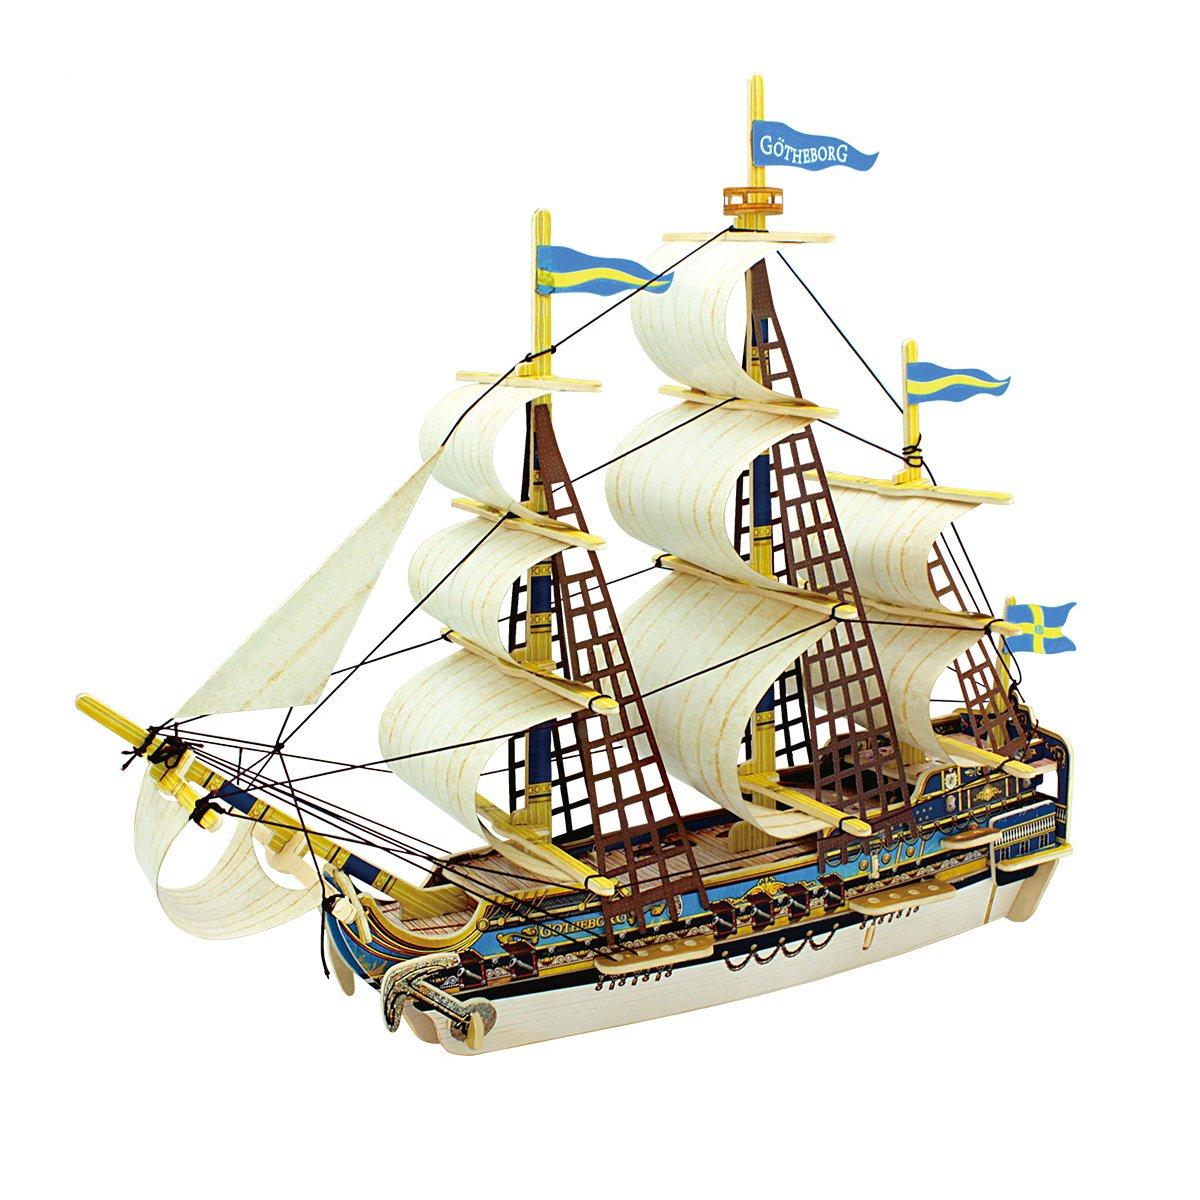 Robotime 3D立体パズル DIY DIY 木製 船 53pcs クラフト 手作りキット クラフト ミニチュア ミニチュア B06WD3WLVM, リビングファニチャー:78885359 --- m2cweb.com